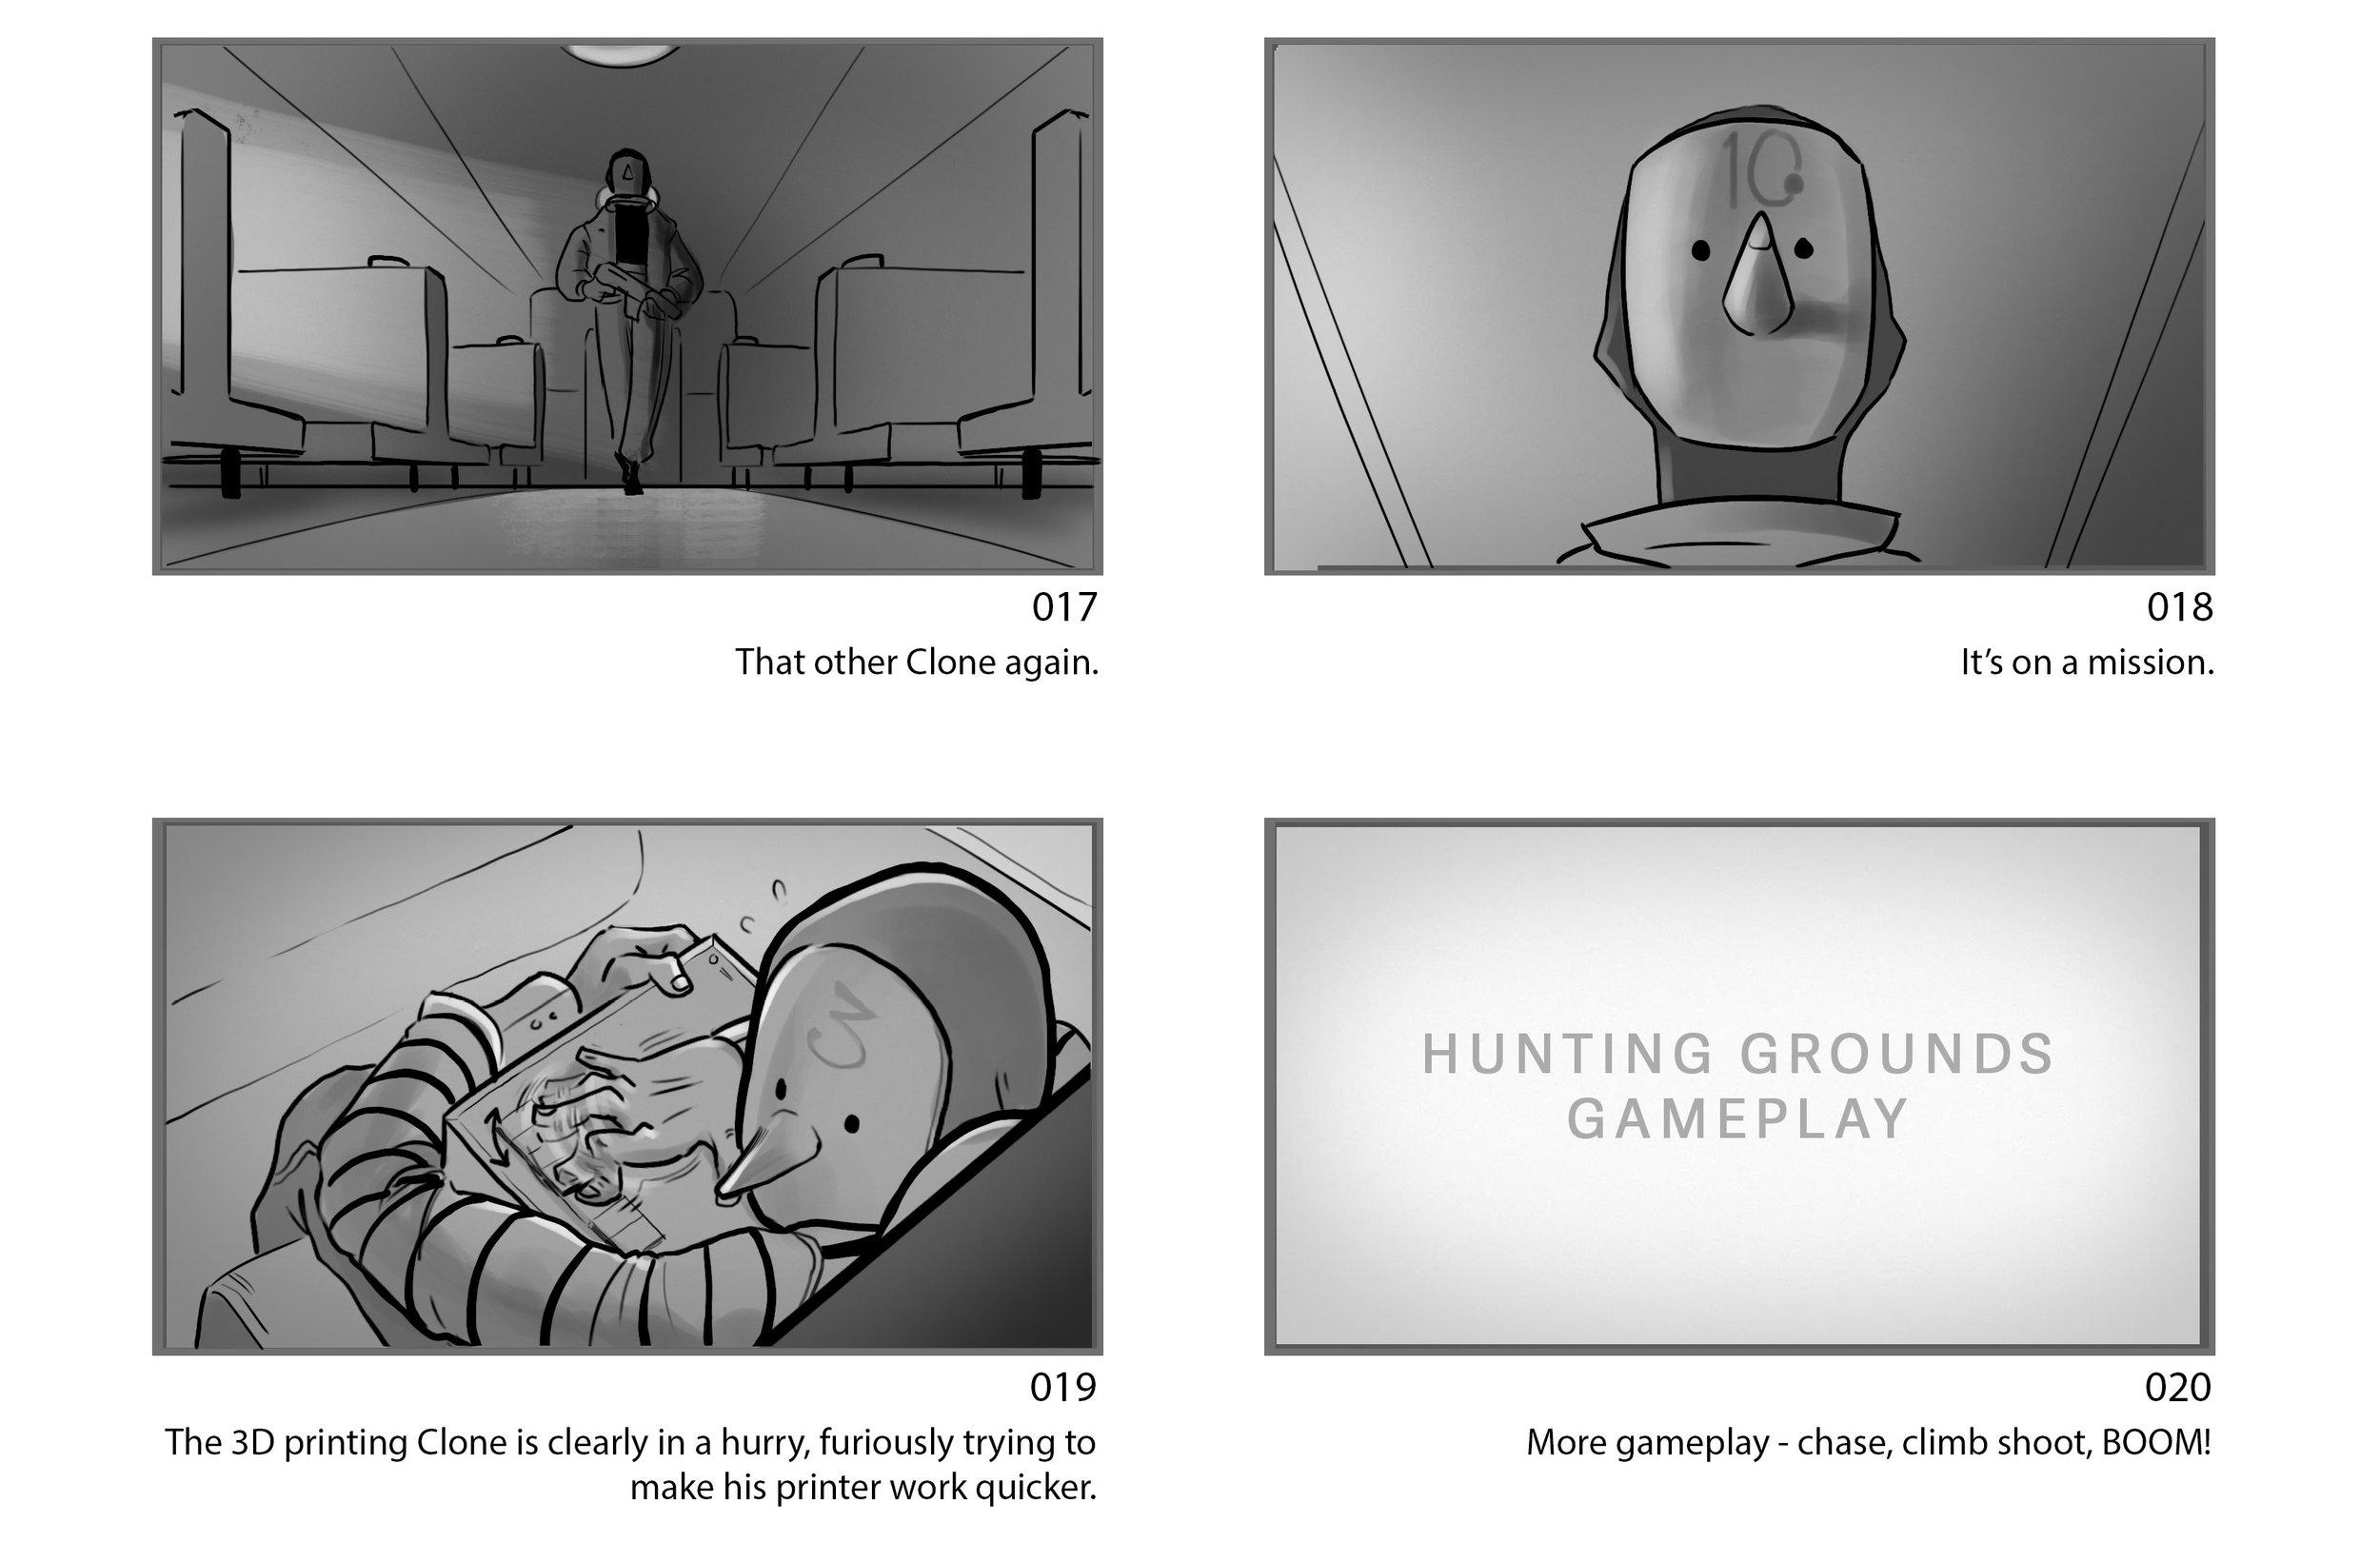 ASGHG_storyboards_0215-5.jpg